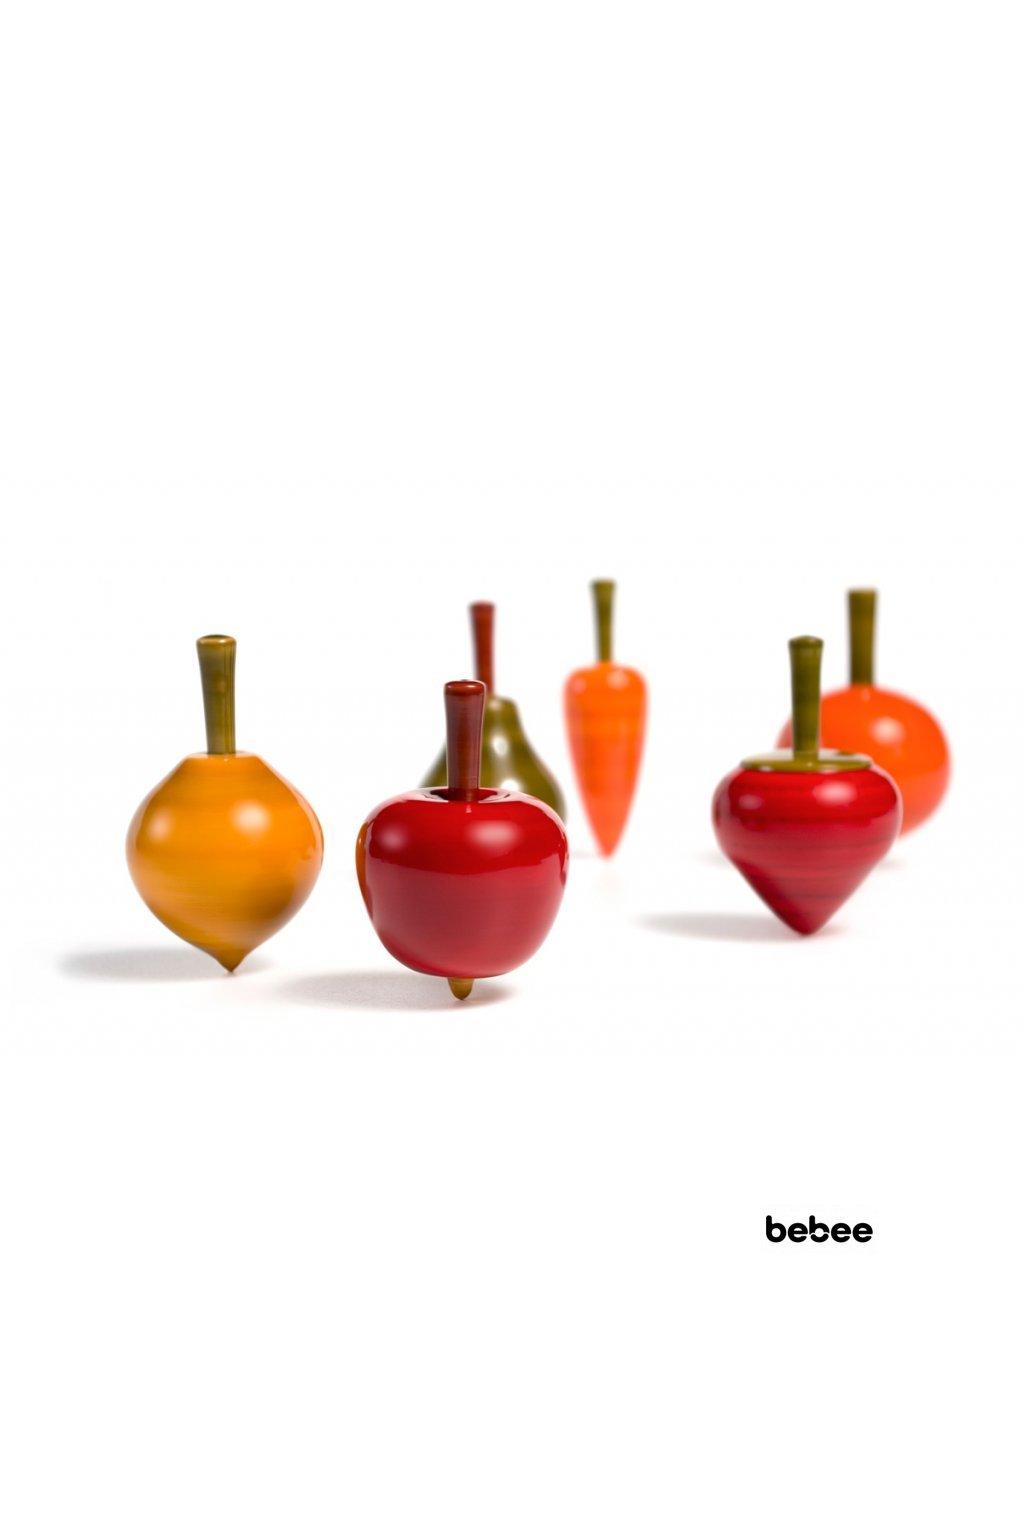 91102 bf036 fruits top mix